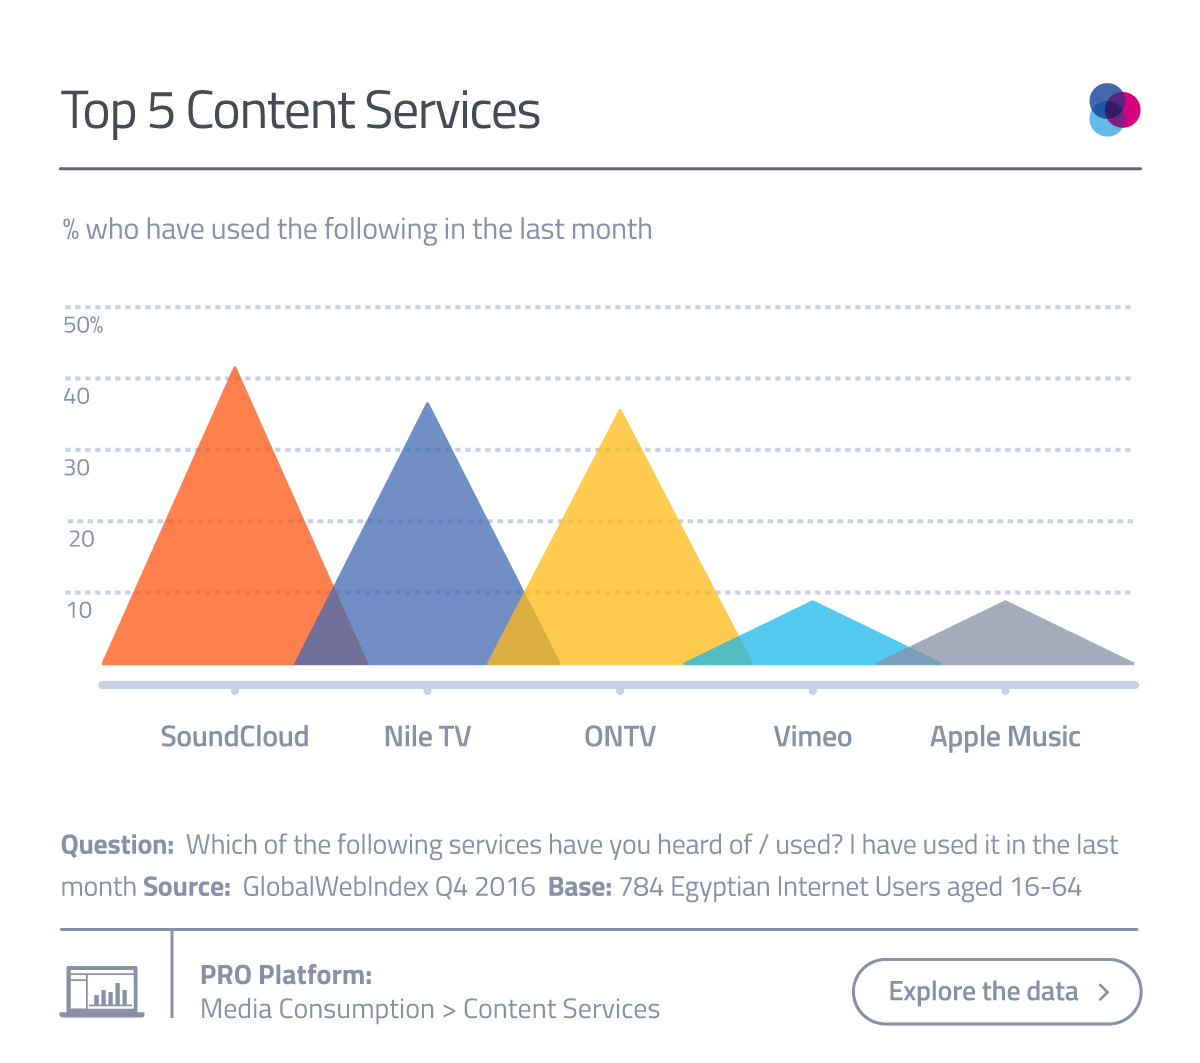 Top 5 Content Services